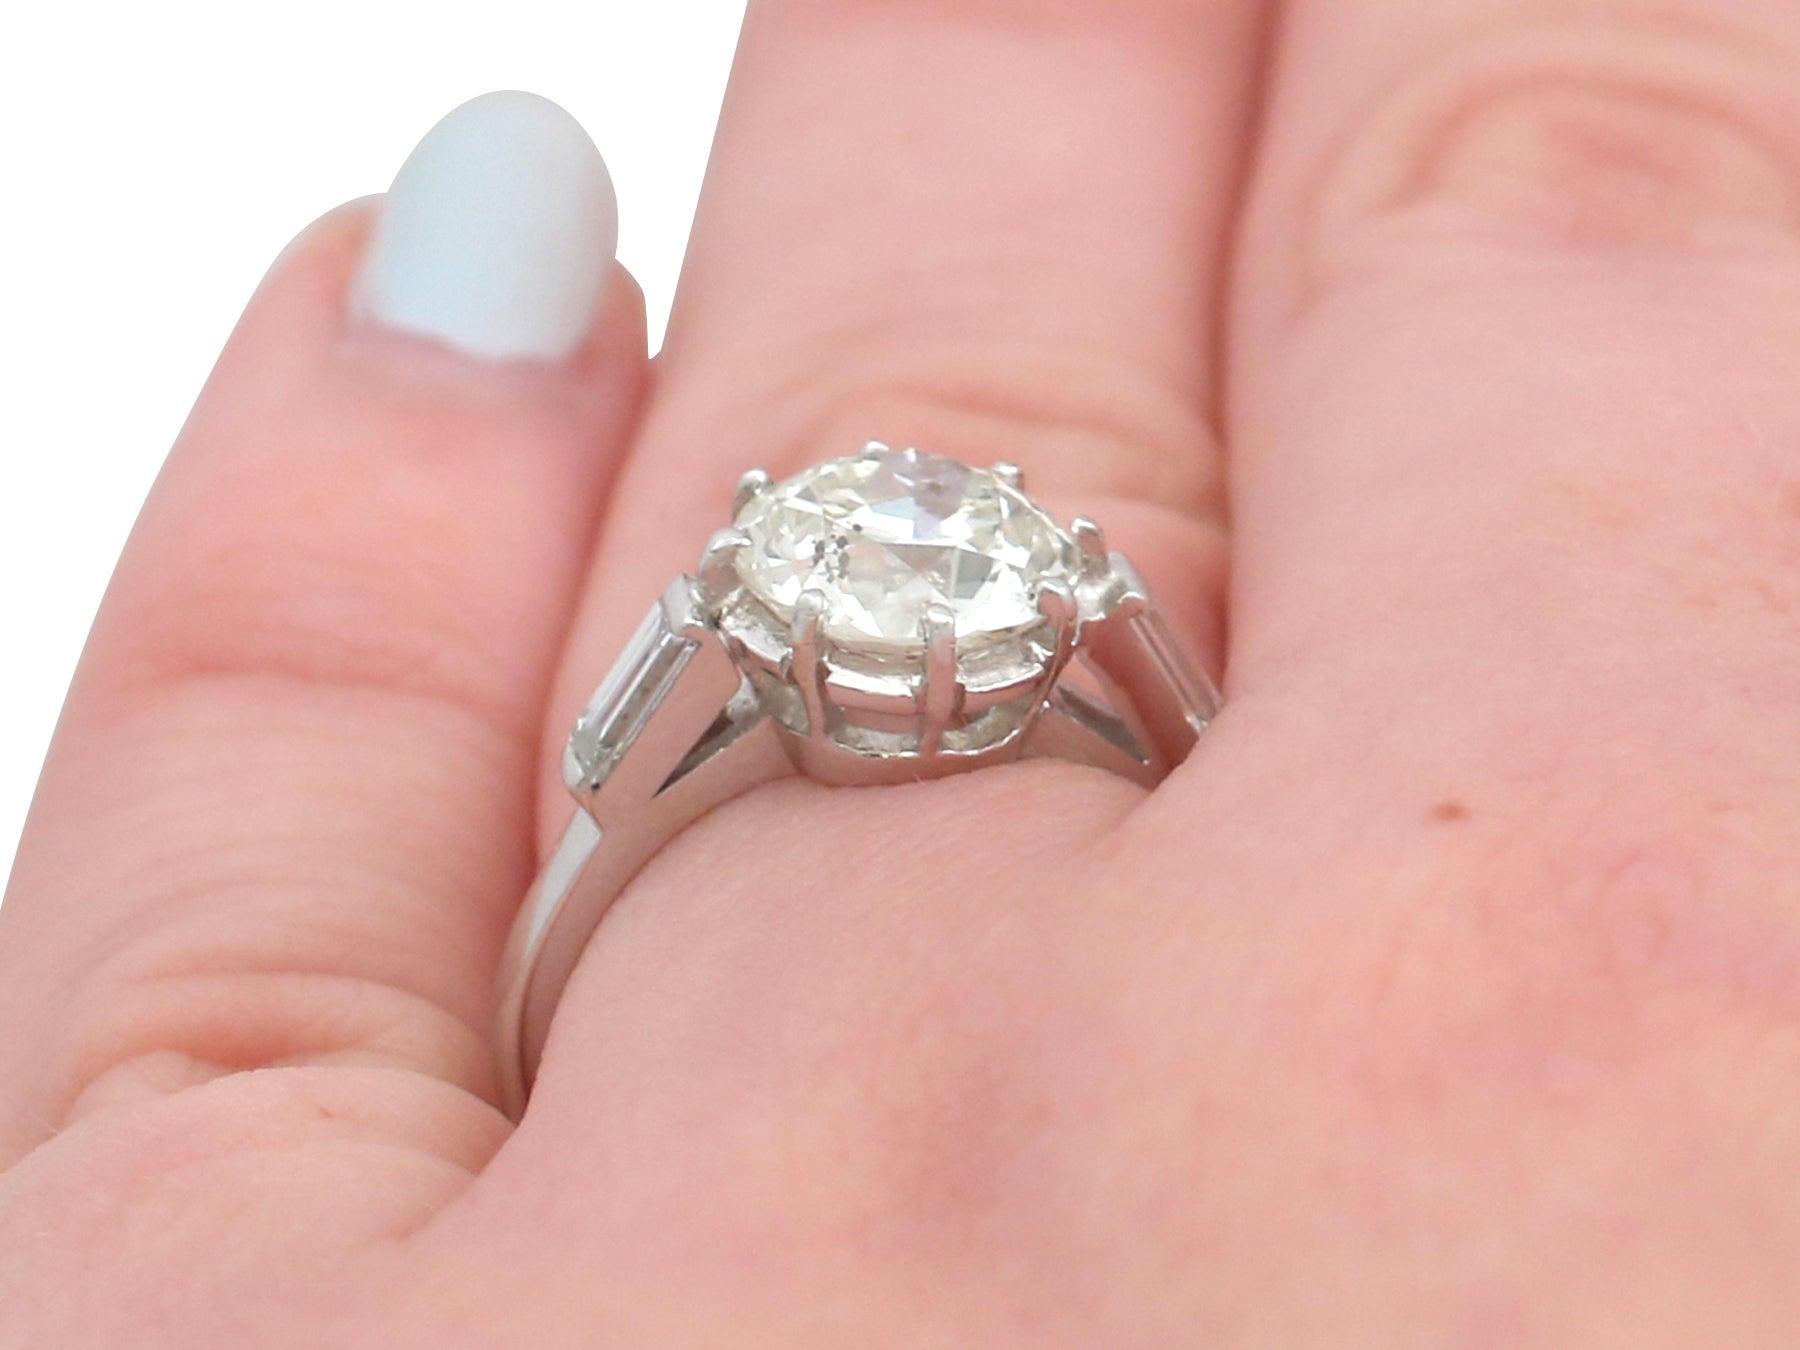 2.78 Carat Diamond and Platinum Solitaire Ring in Art Deco Style ...